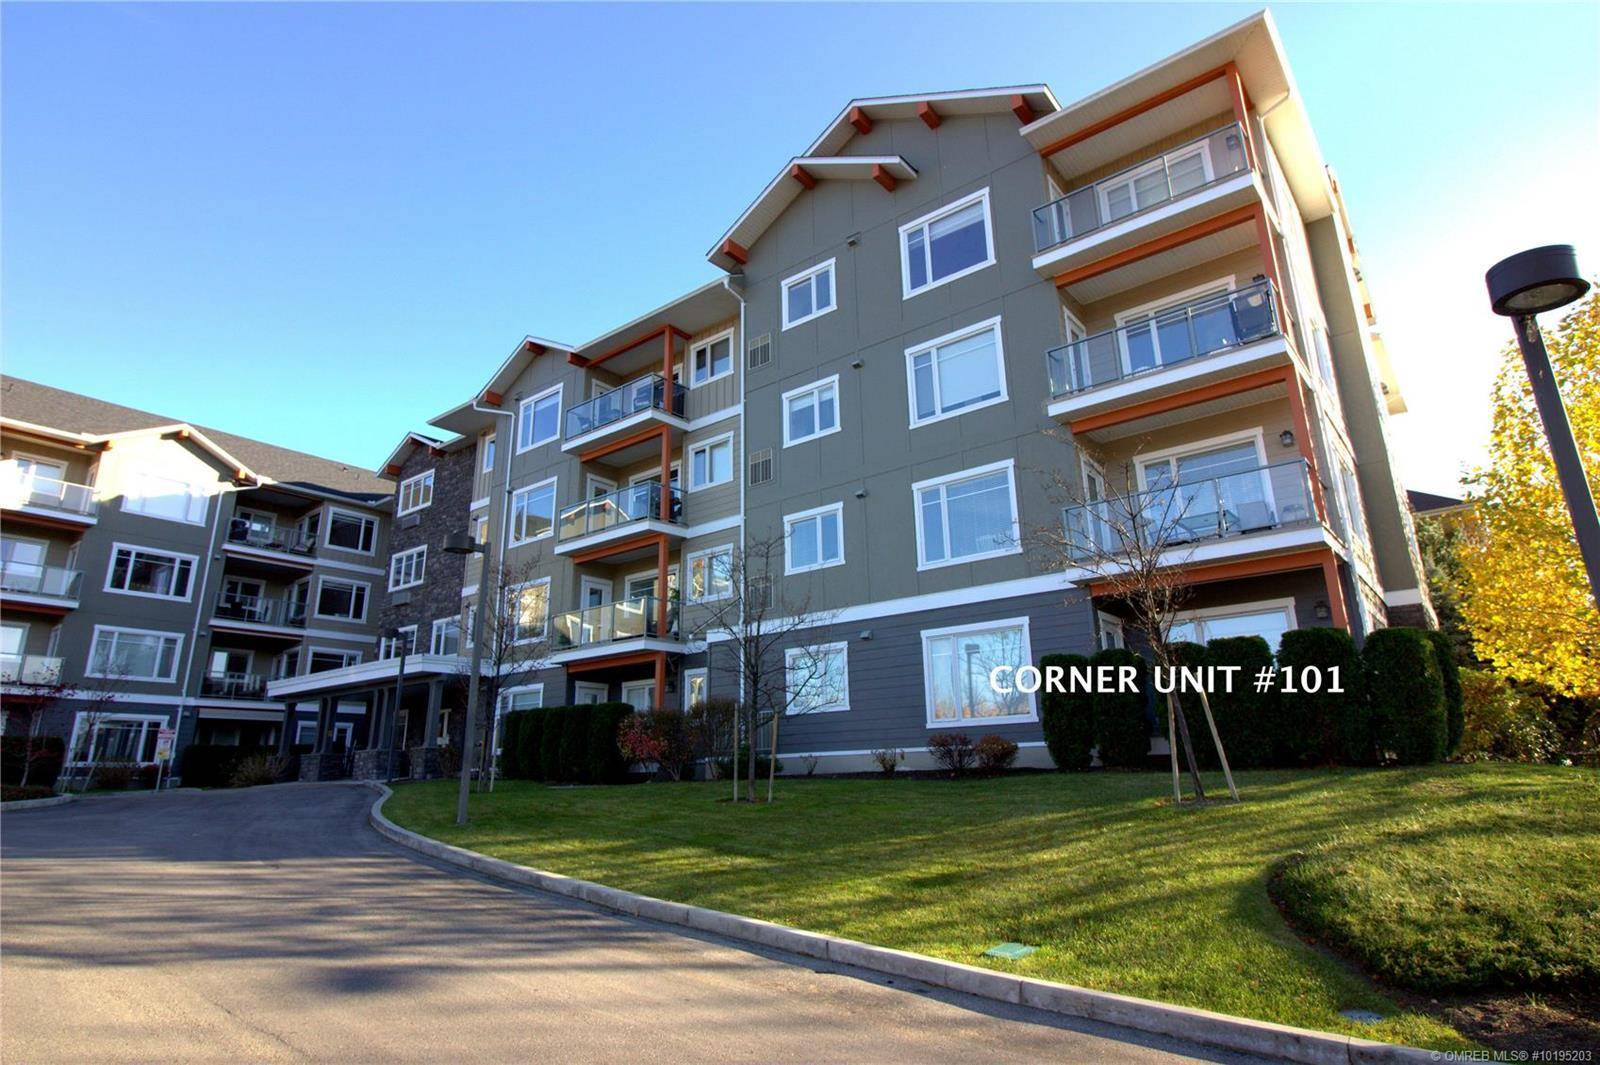 Condo for sale at 660 Lequime Rd Unit 101 Kelowna British Columbia - MLS: 10195203